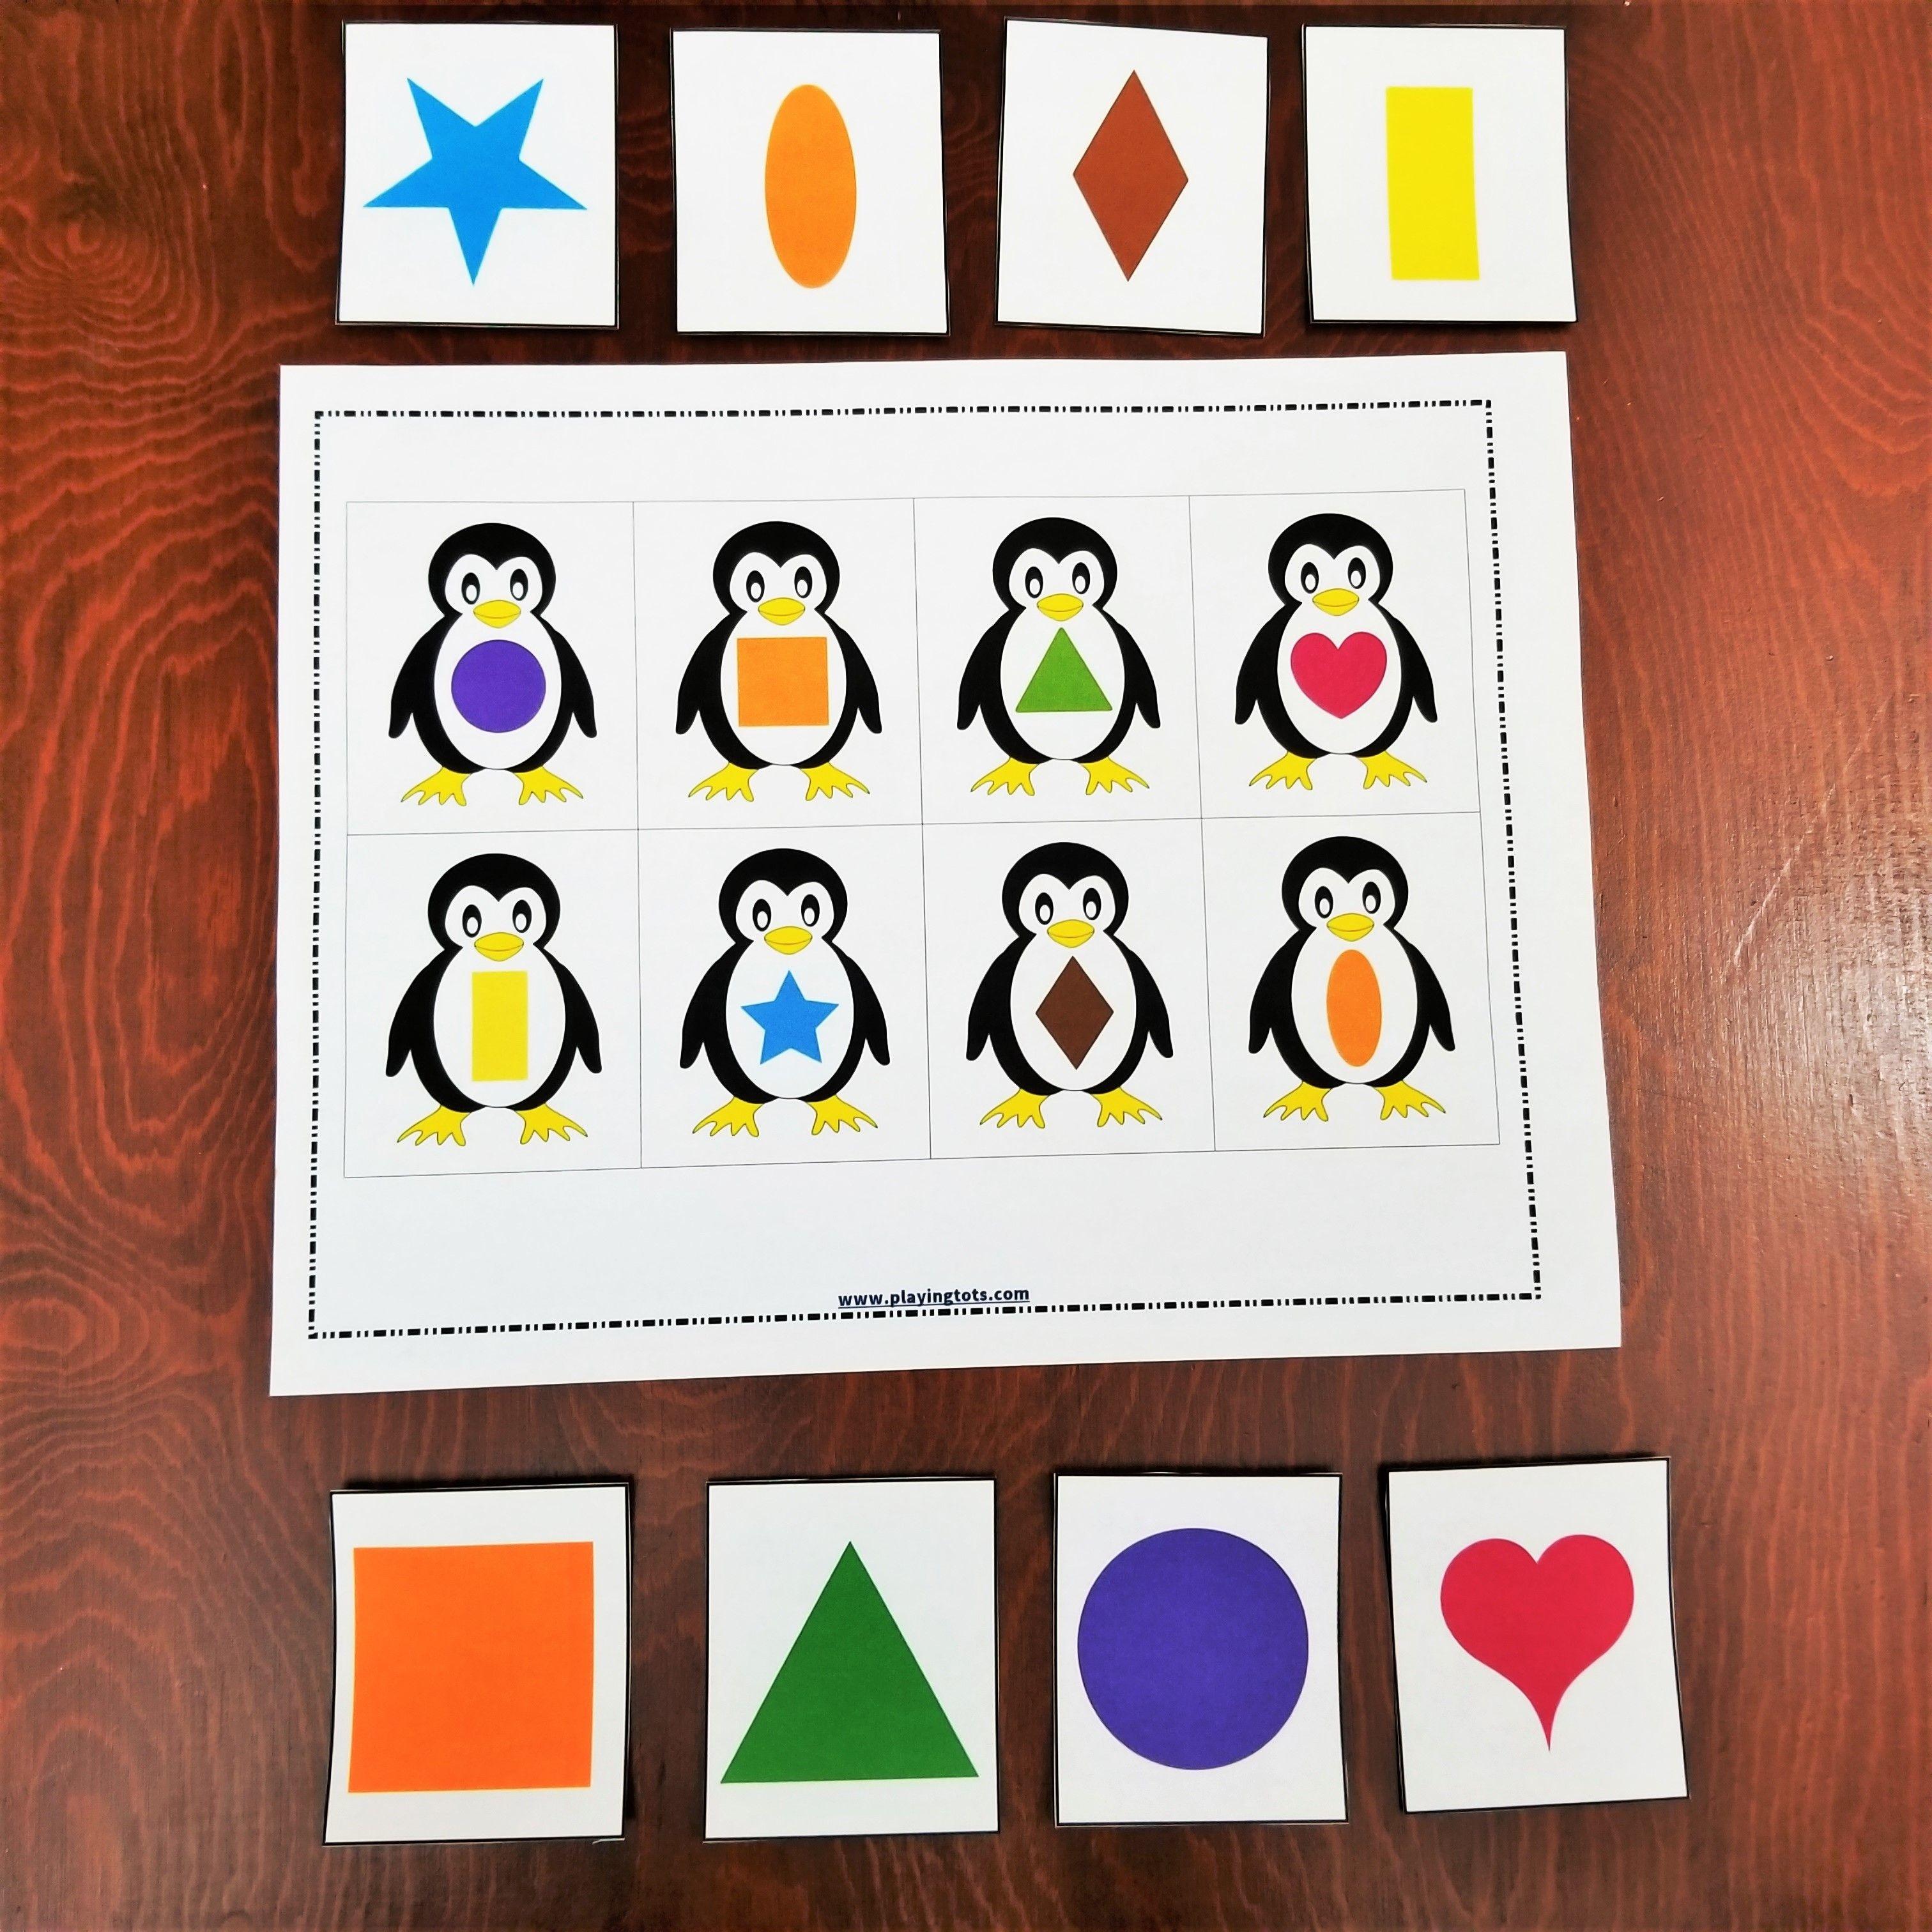 Keywords: Matching,activities,shapes,penguin,animals,toddler,free - Free Printable Preschool Folder Games